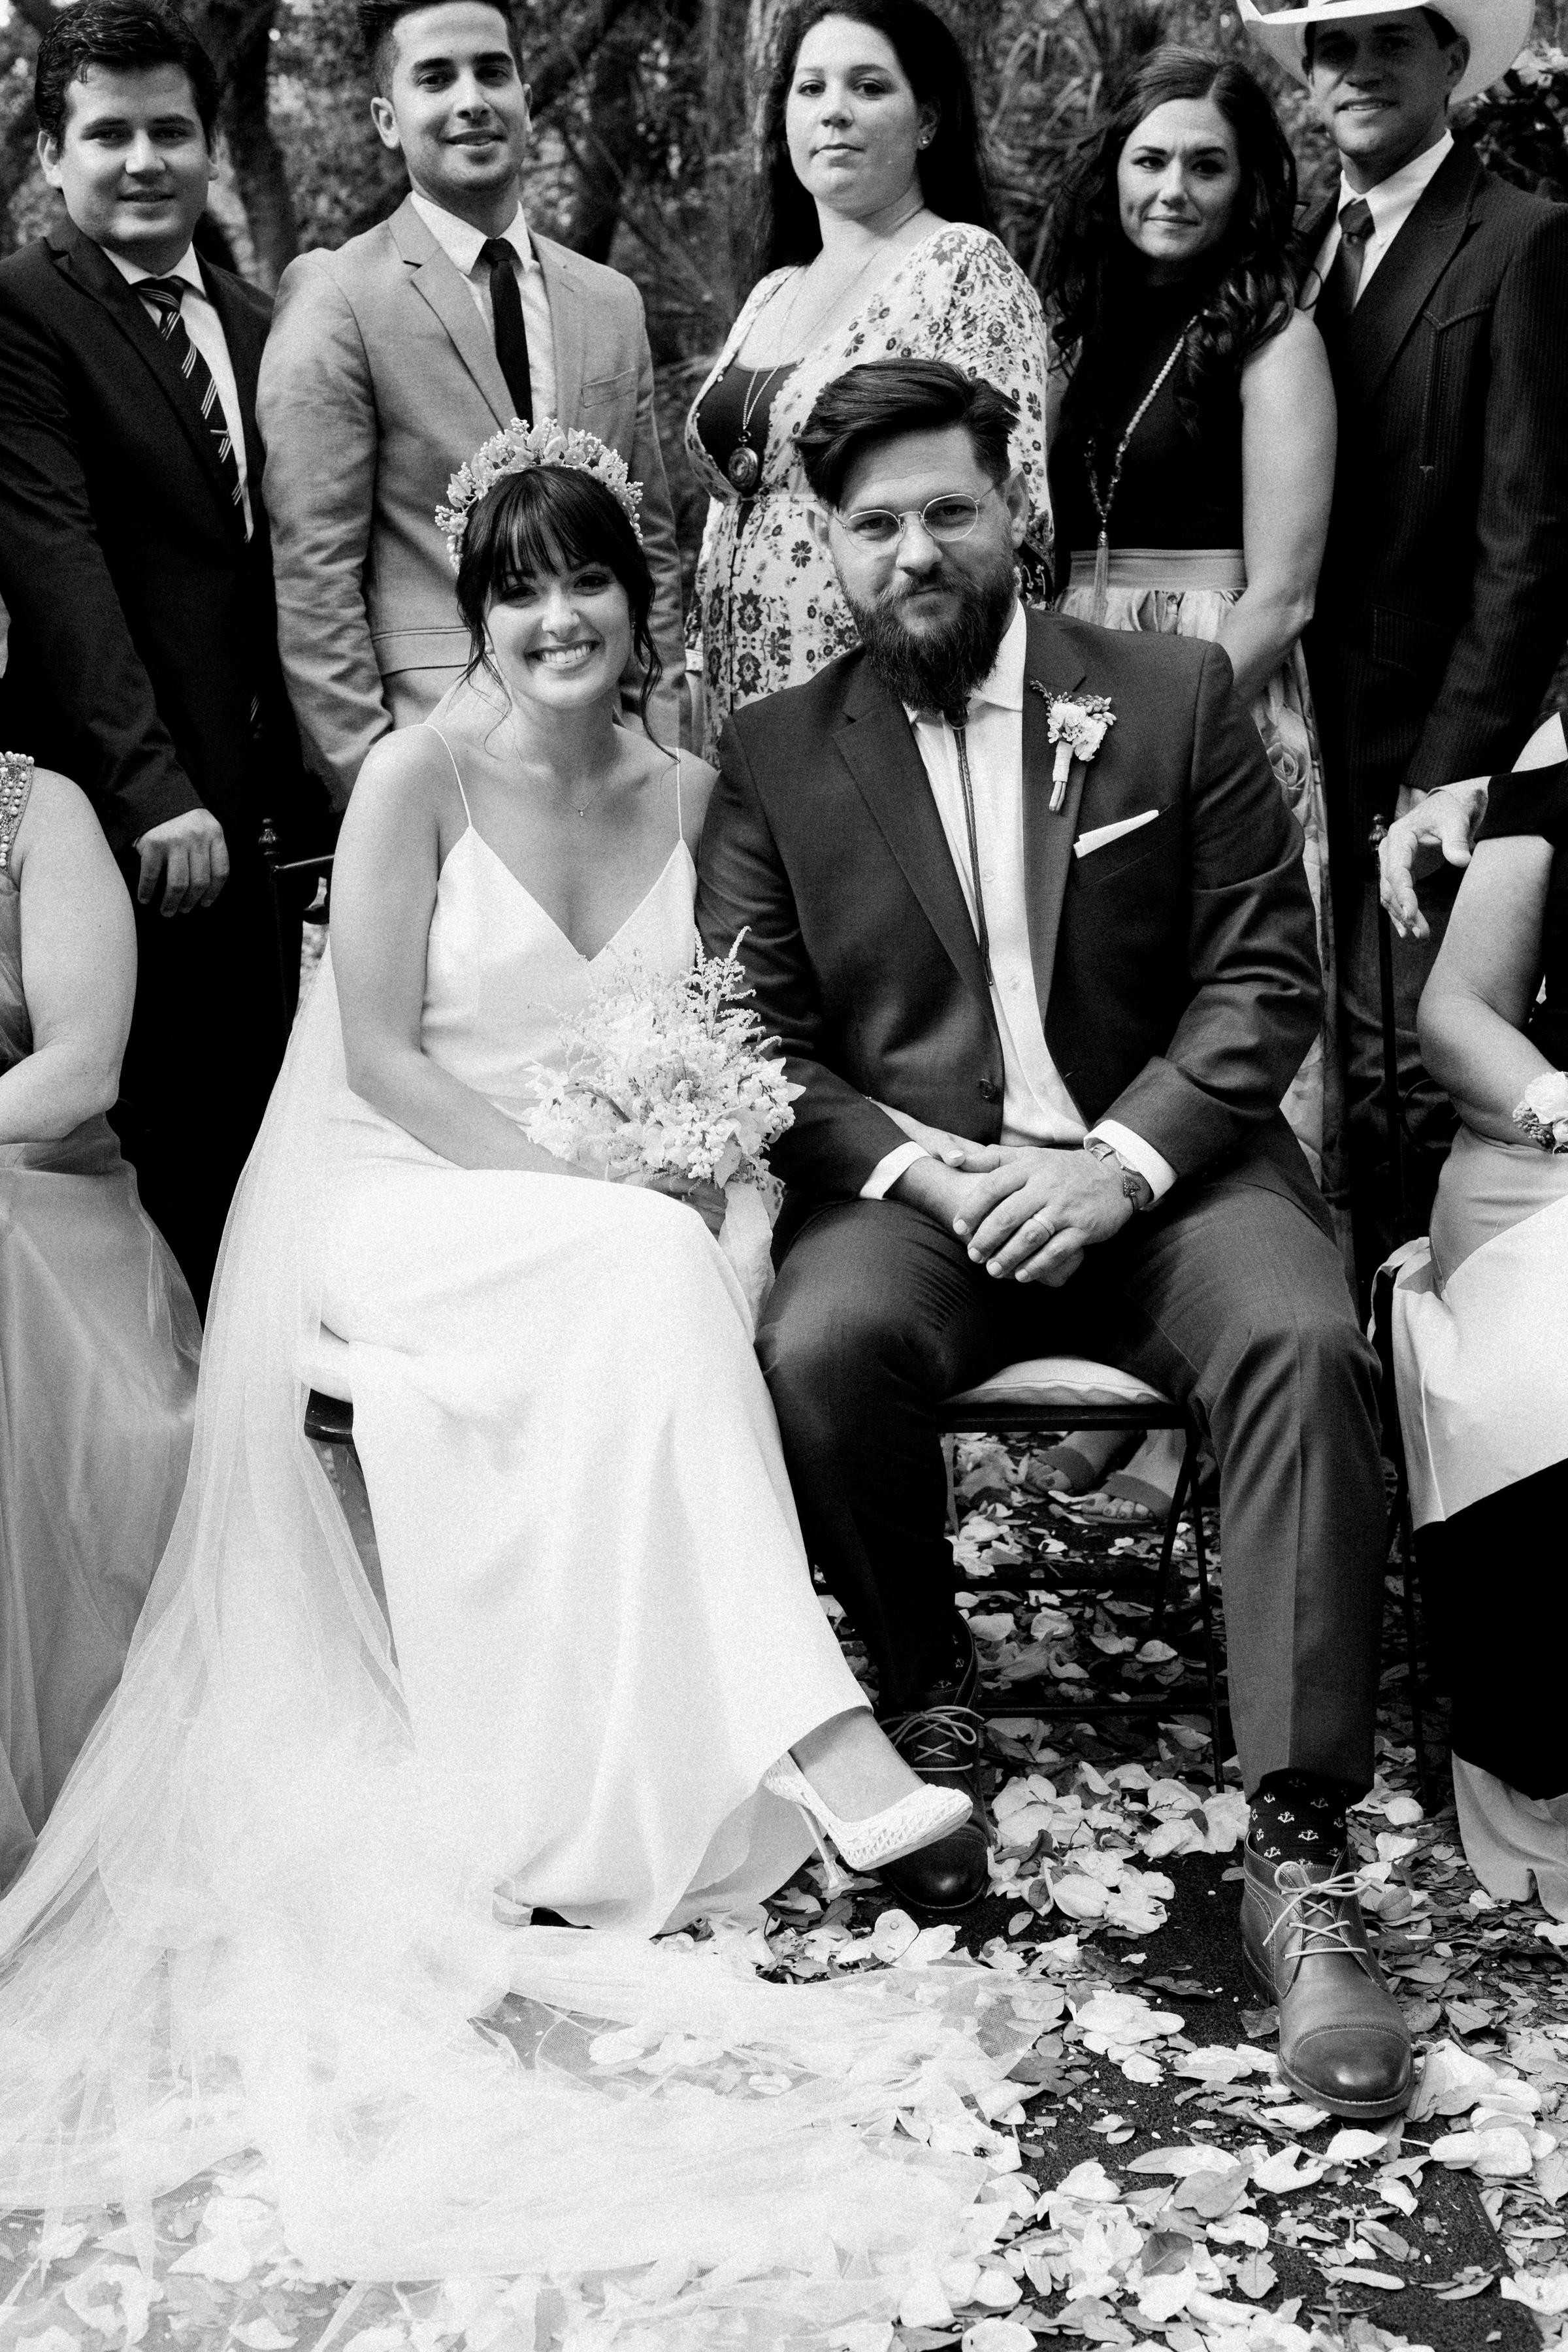 37-family-portrait-wedding.jpg